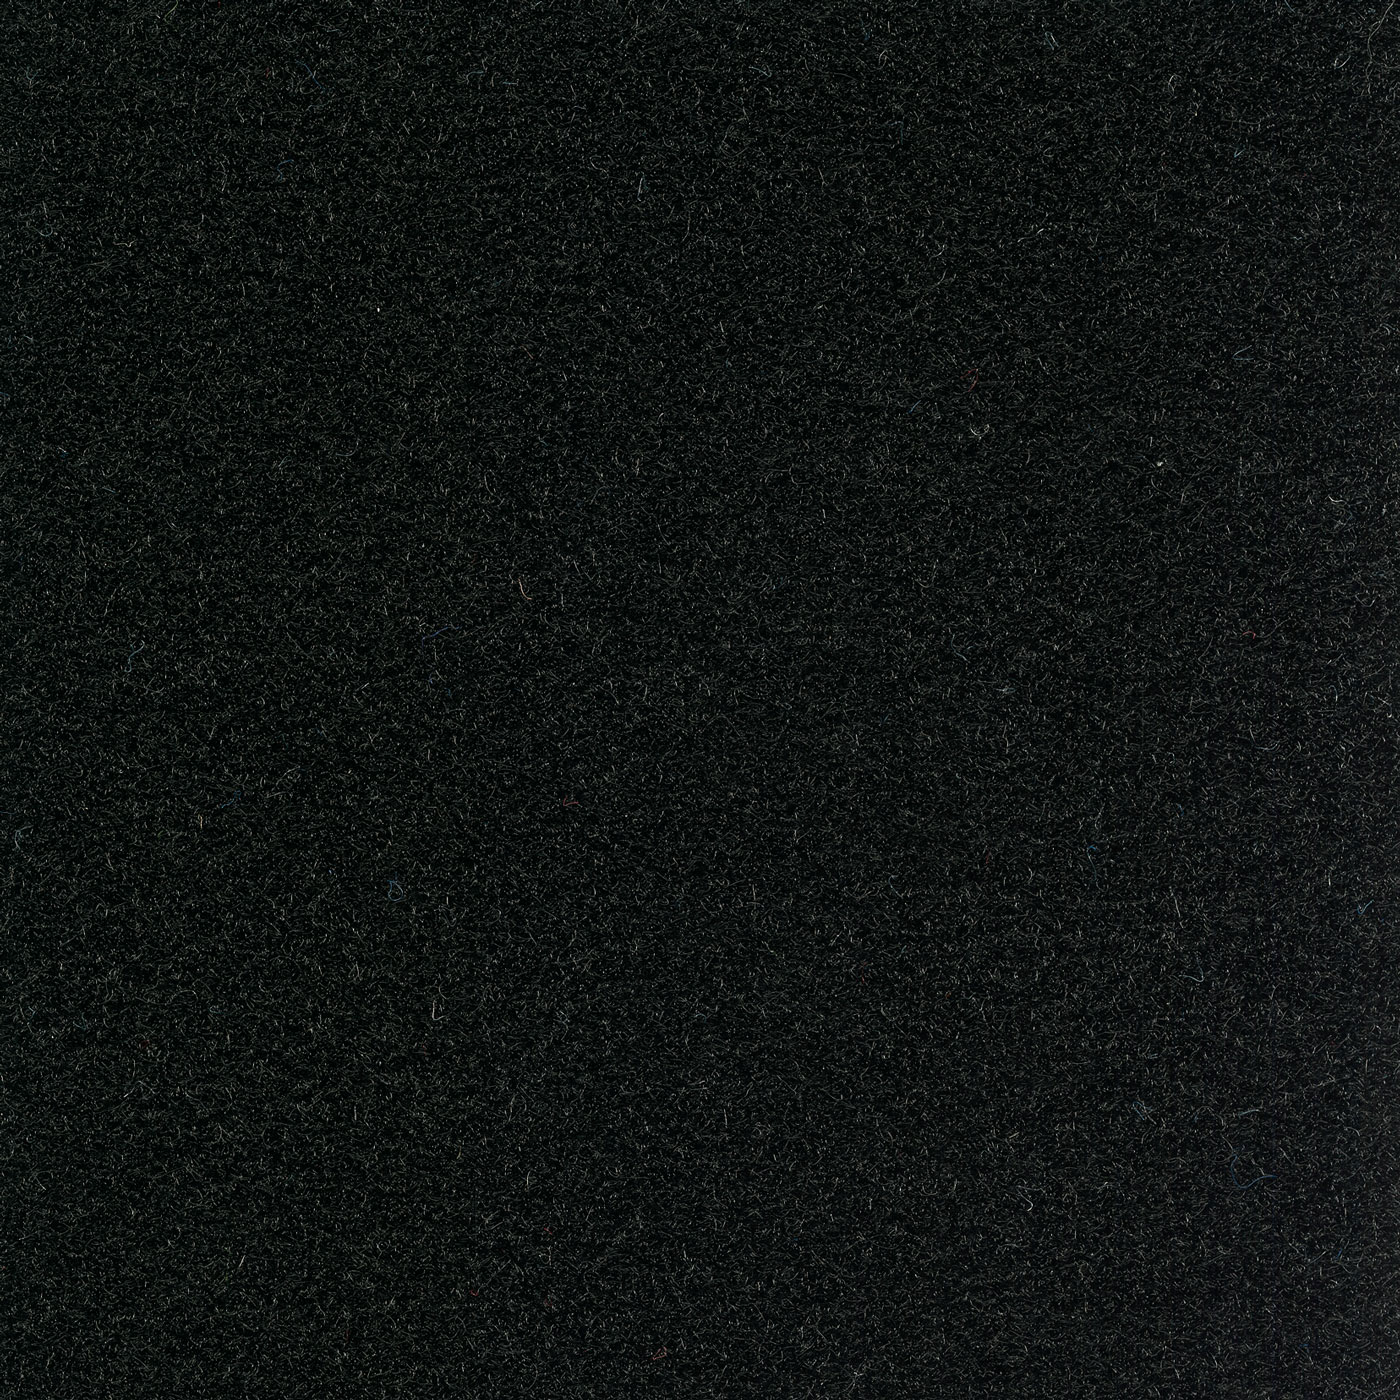 1400x1400 Image